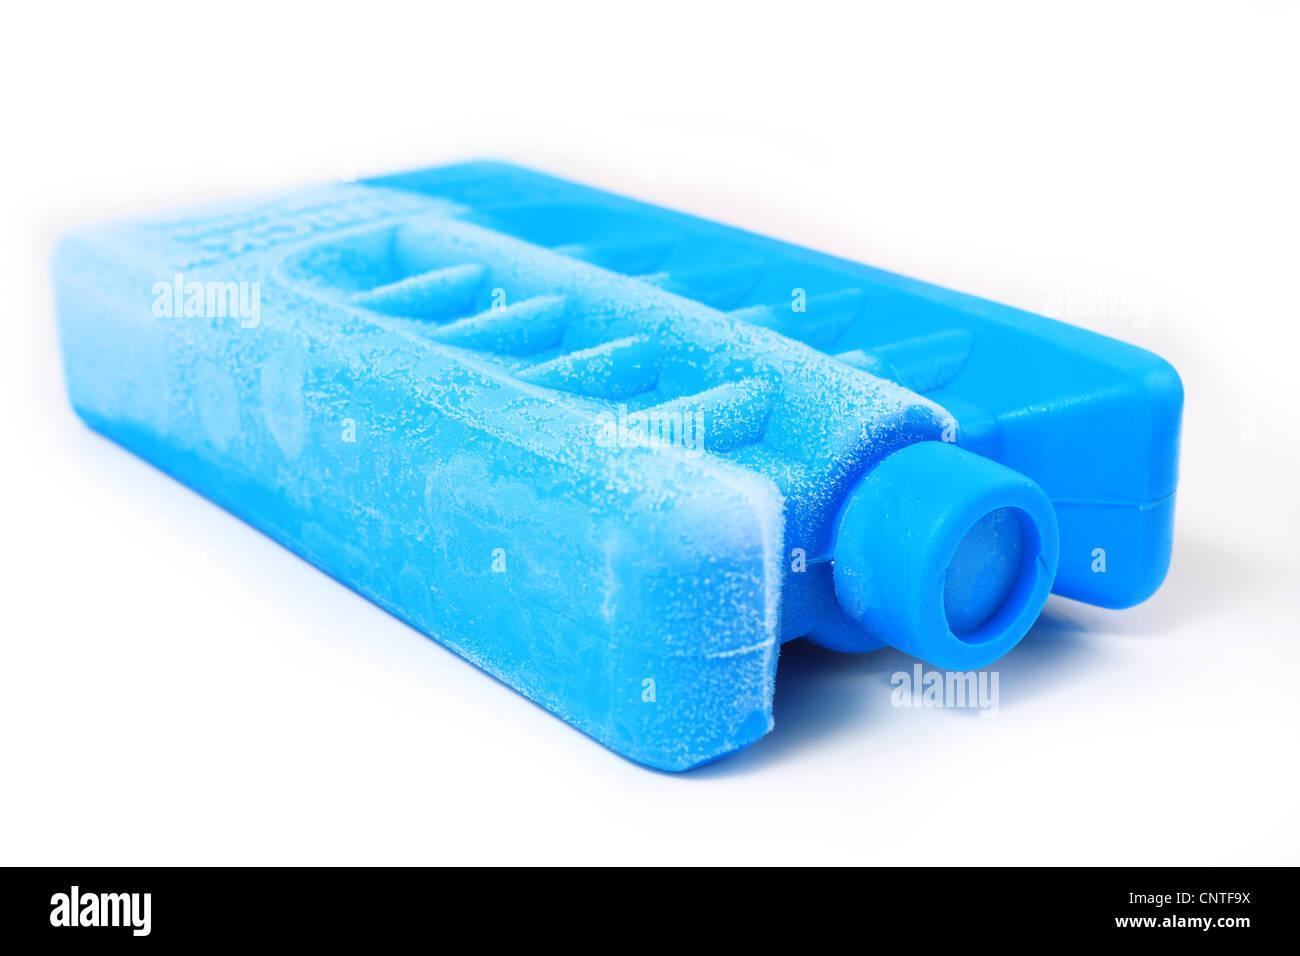 ice brick - Stock Image